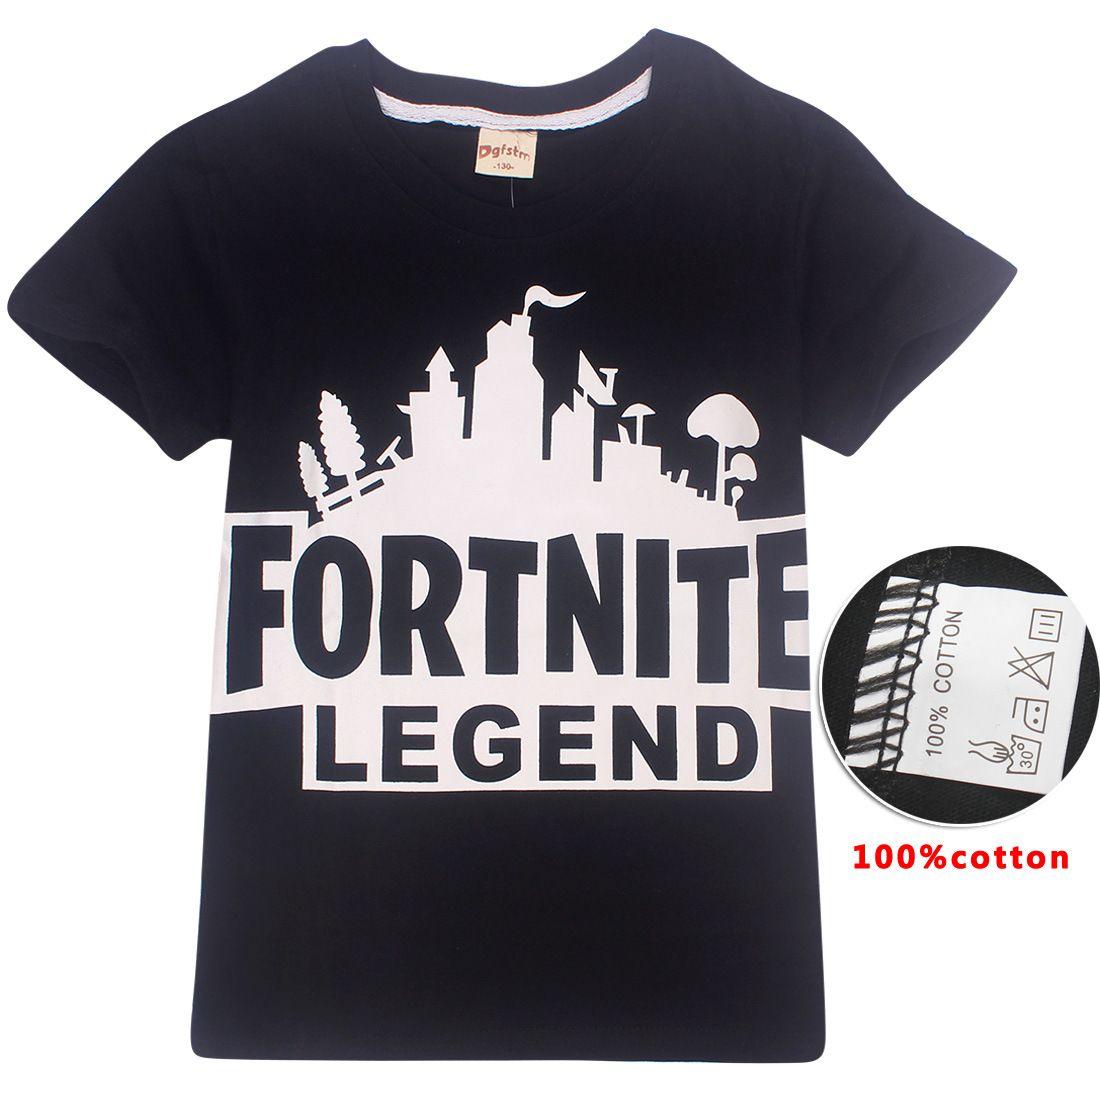 Boys Girls Fortnite T Shirt 2018 New Children Game Cartoon Cotton